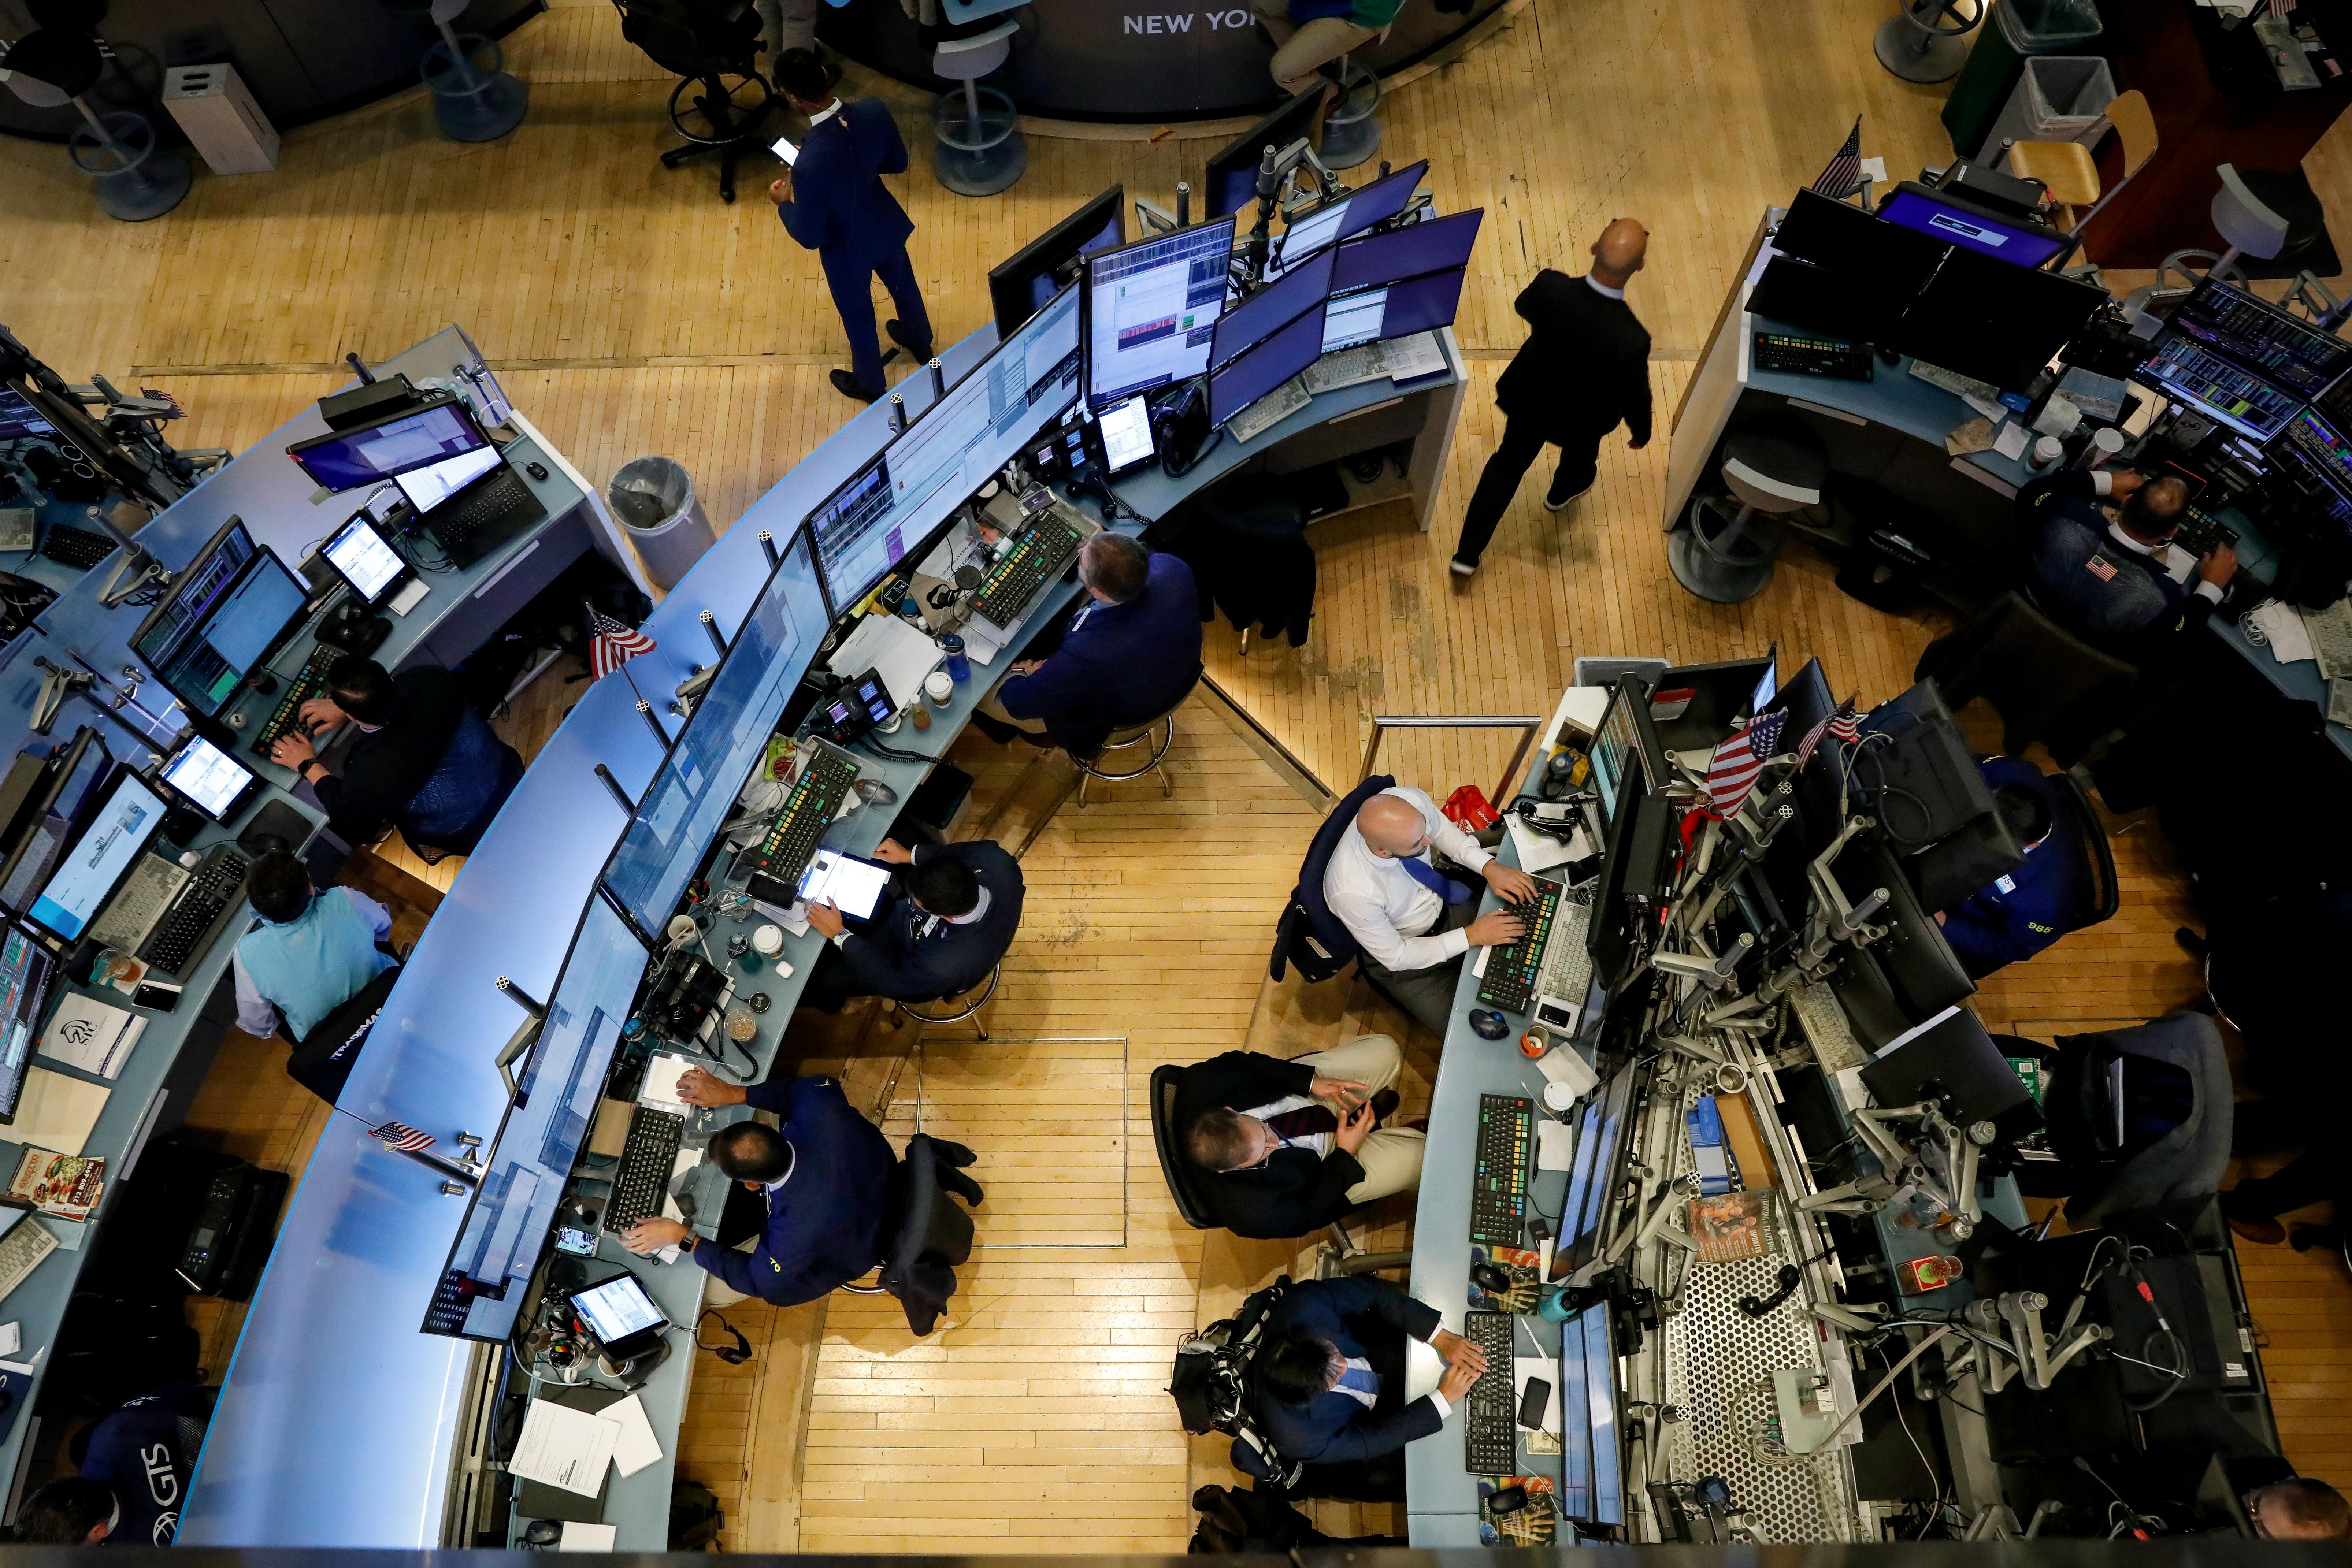 Global stocks, bond yields lifted by U.S.-China trade hopes